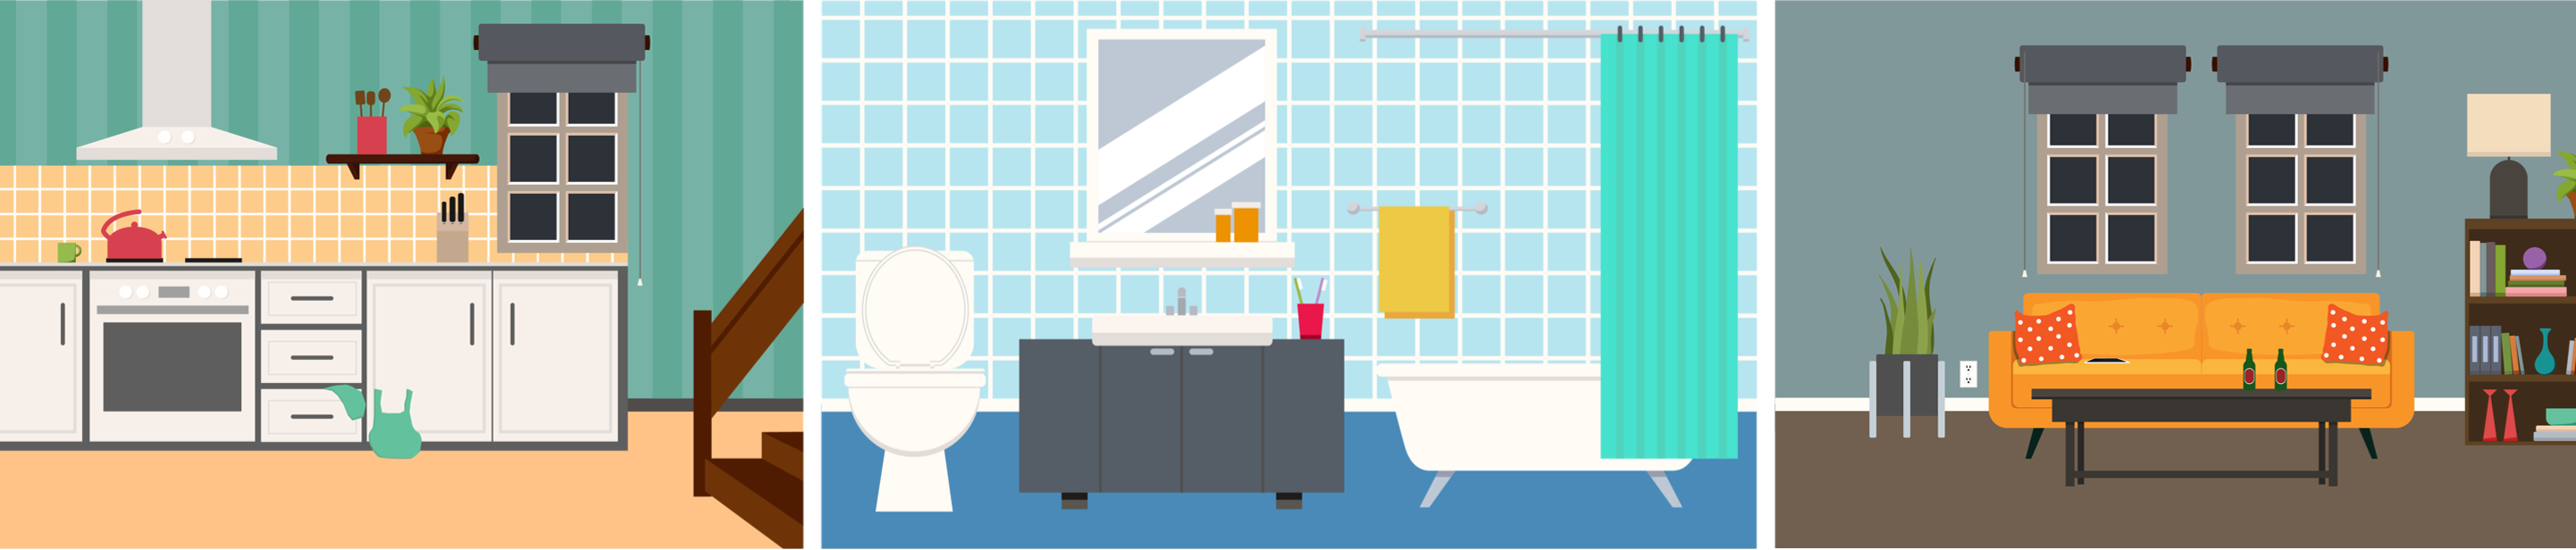 fcu-room-illustrations-full-width